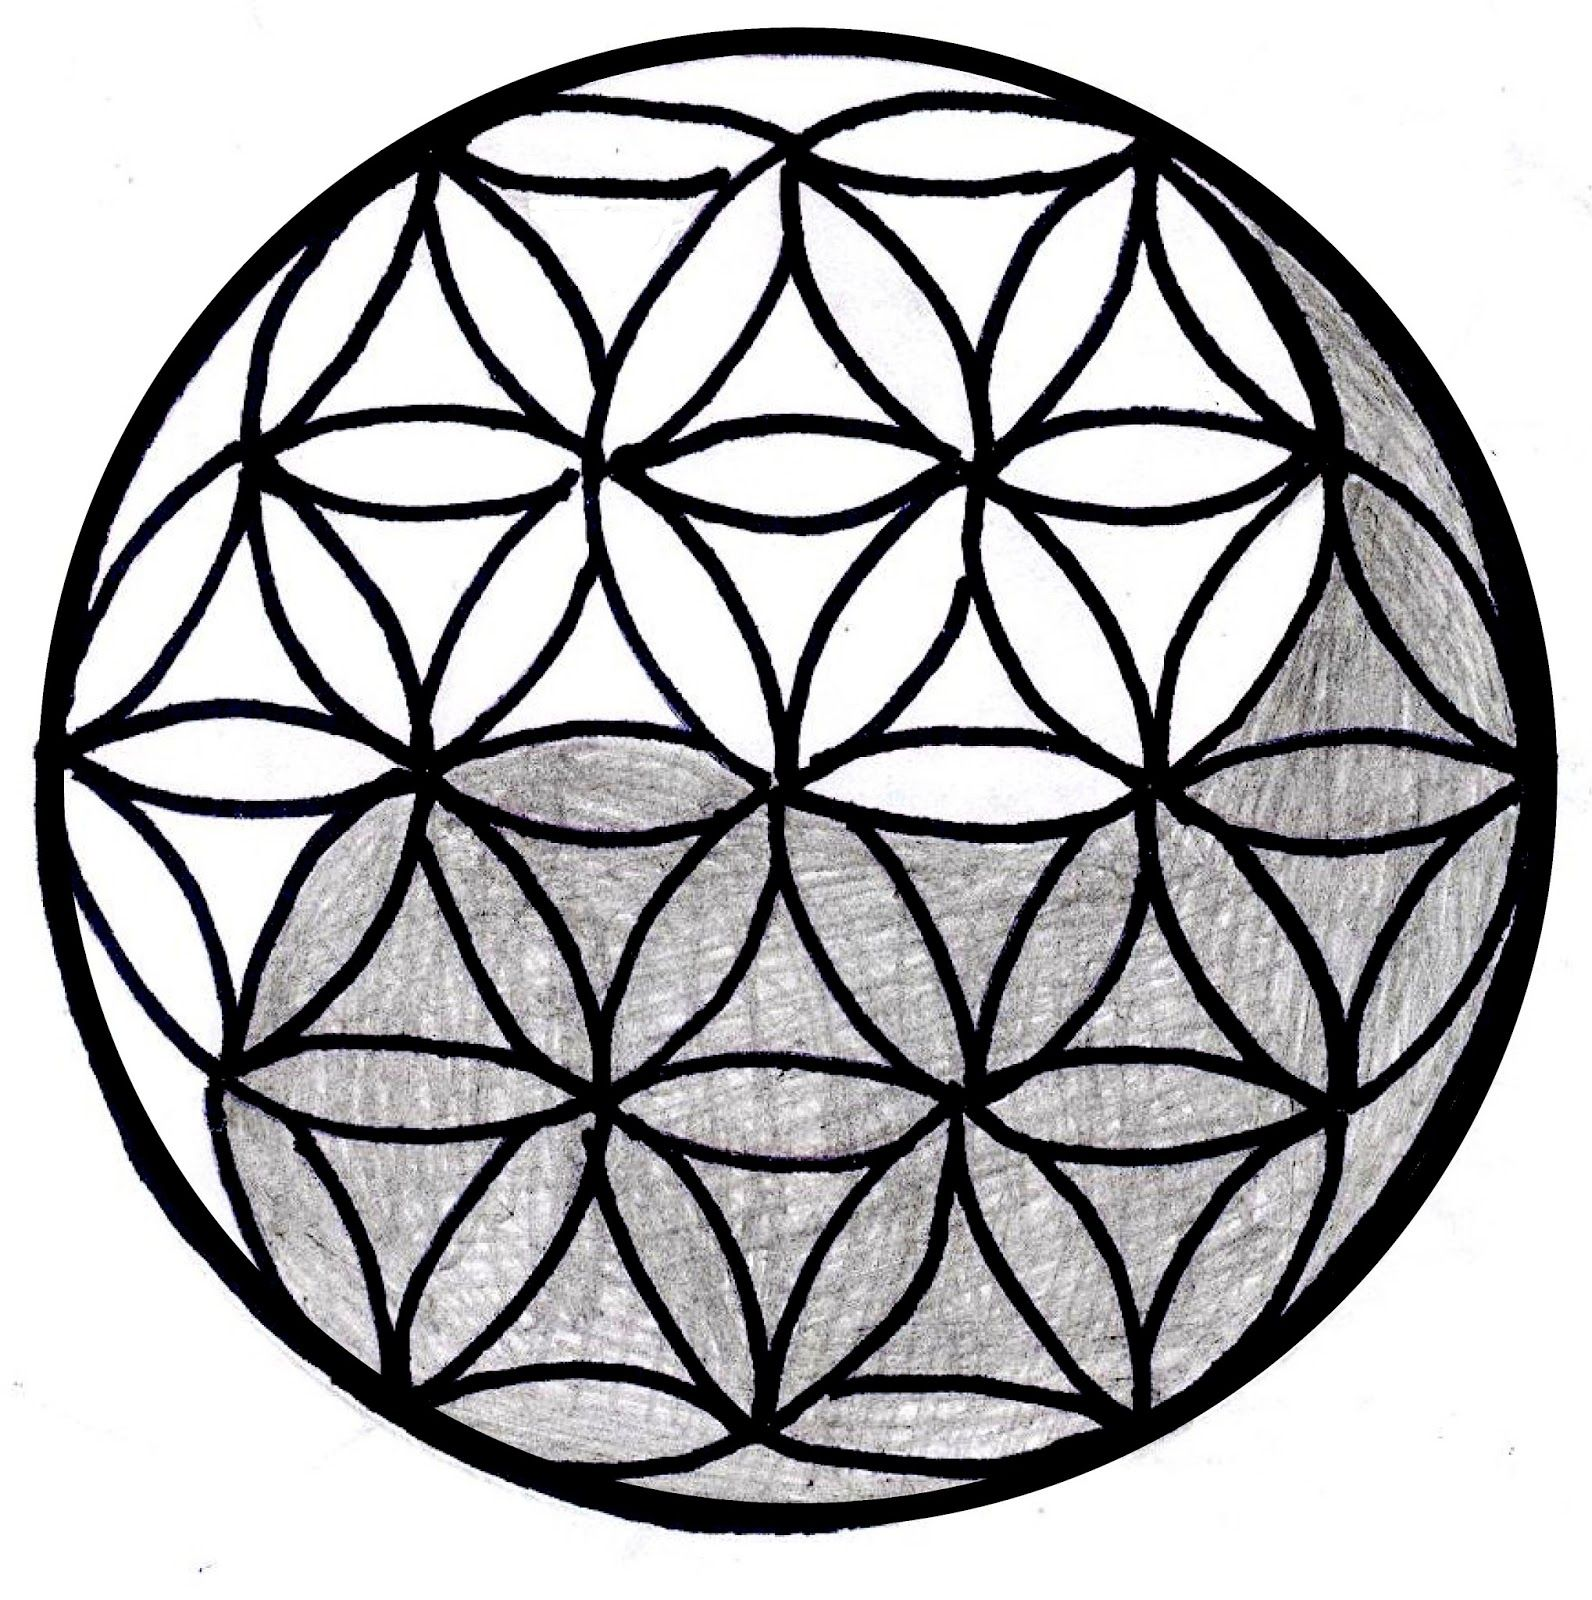 masonic art deciphered page 1 sacred geometry pinterest rh pinterest com Flower of Life Meaning Yin and Yang Wolf